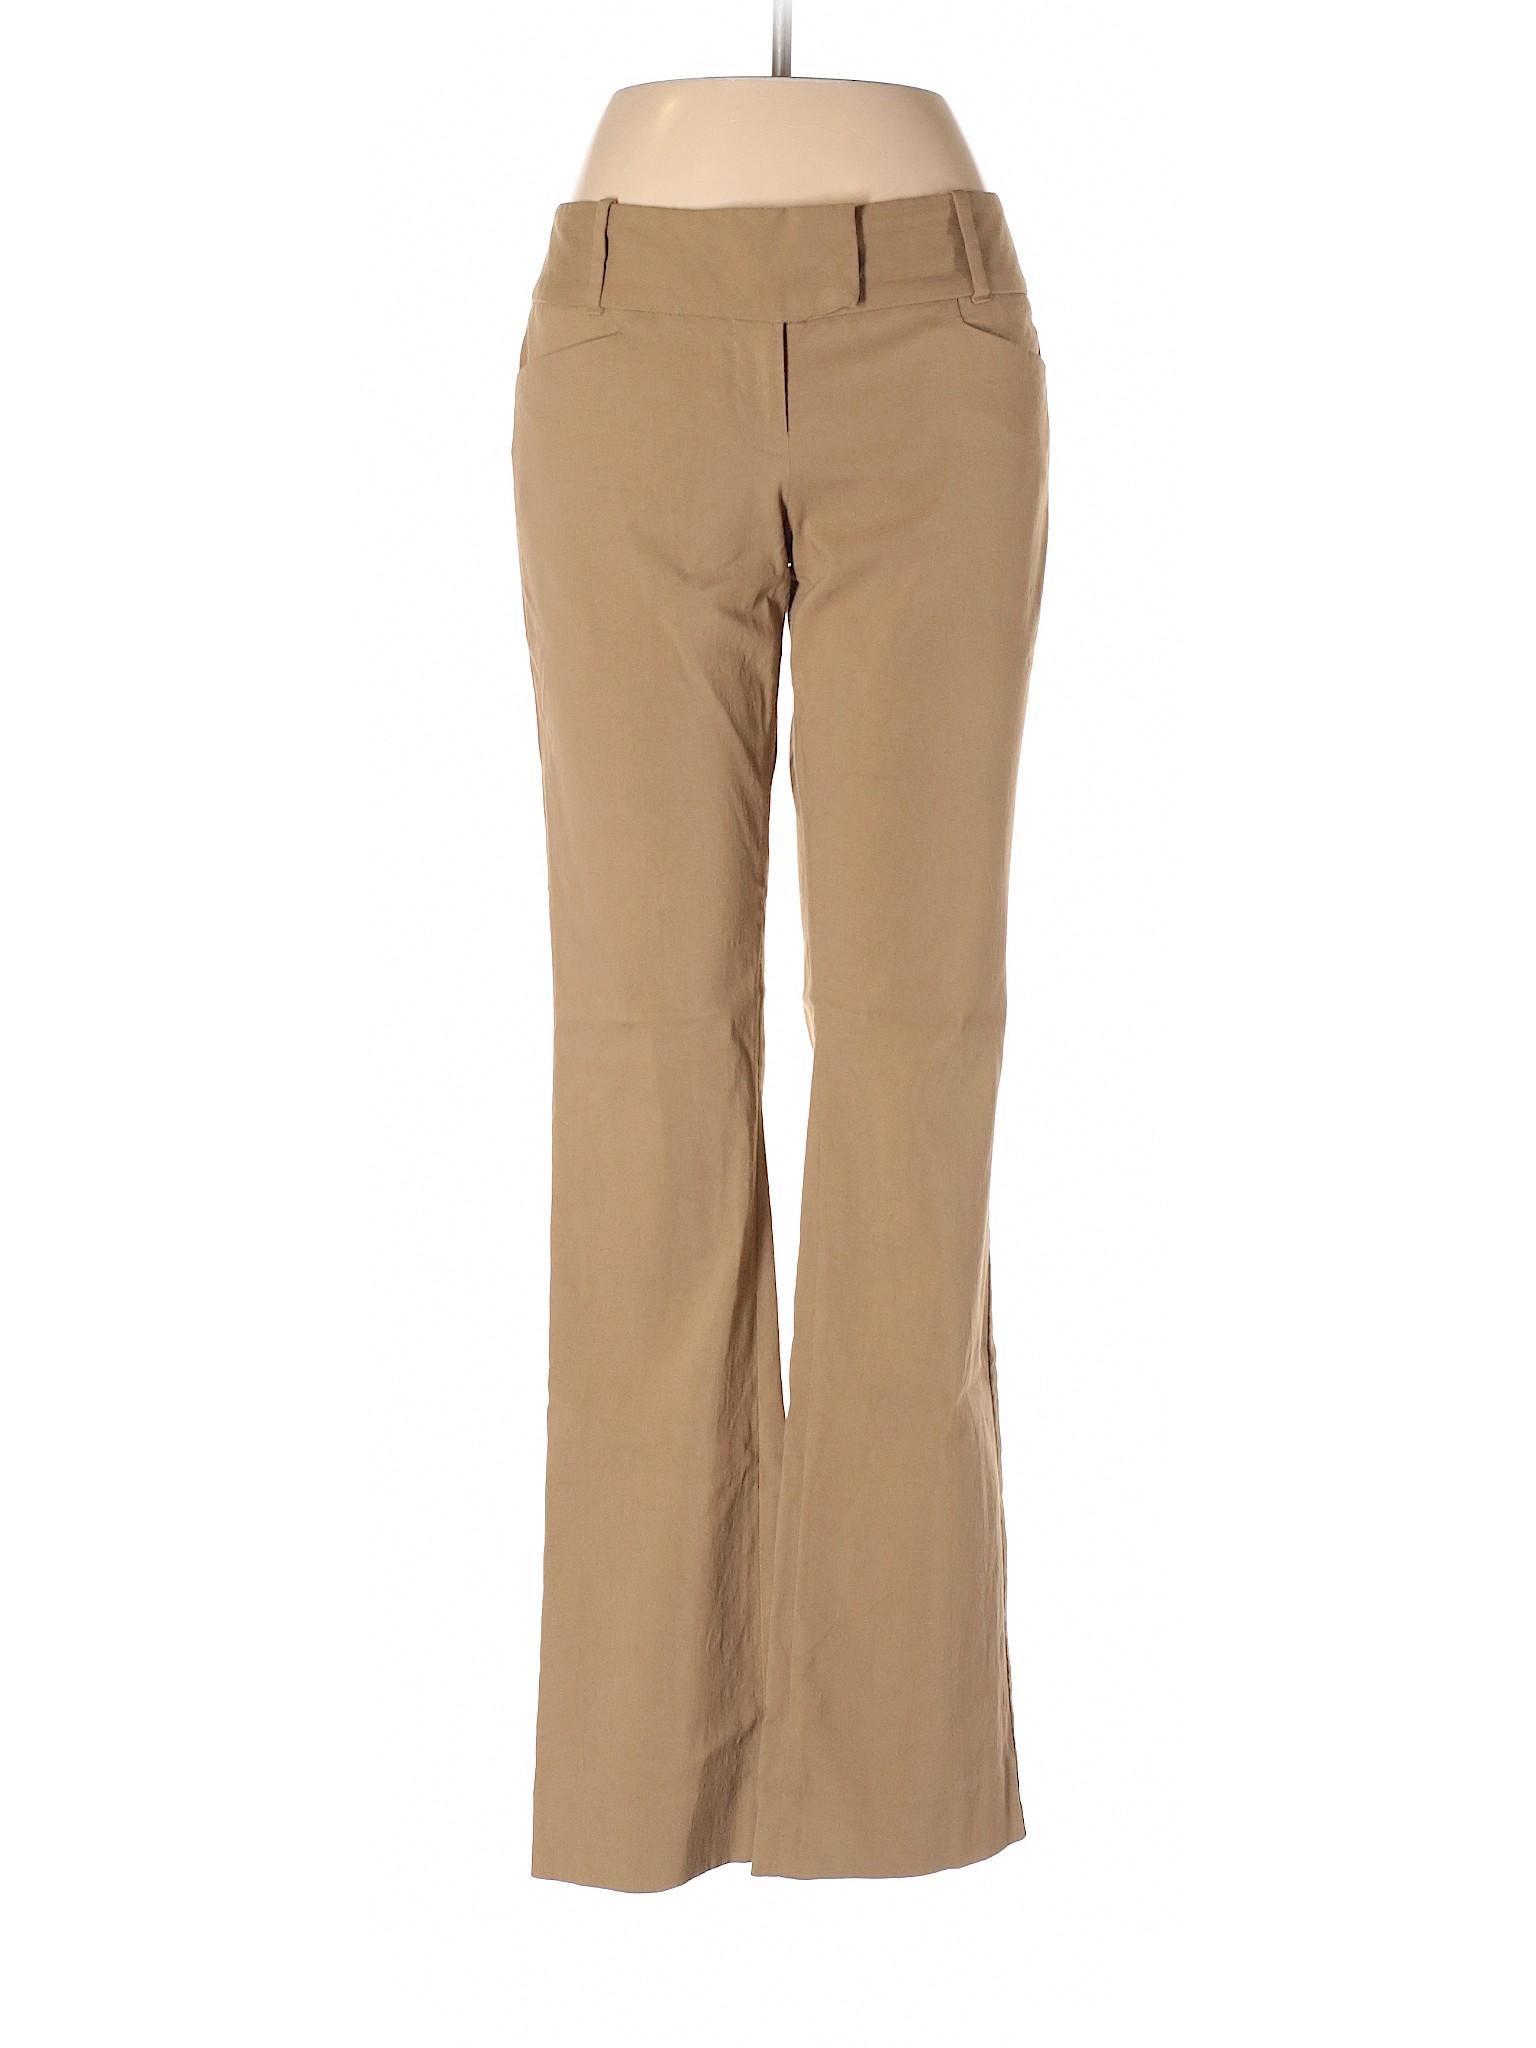 winter Dress The Boutique Pants Limited qdXxYaap